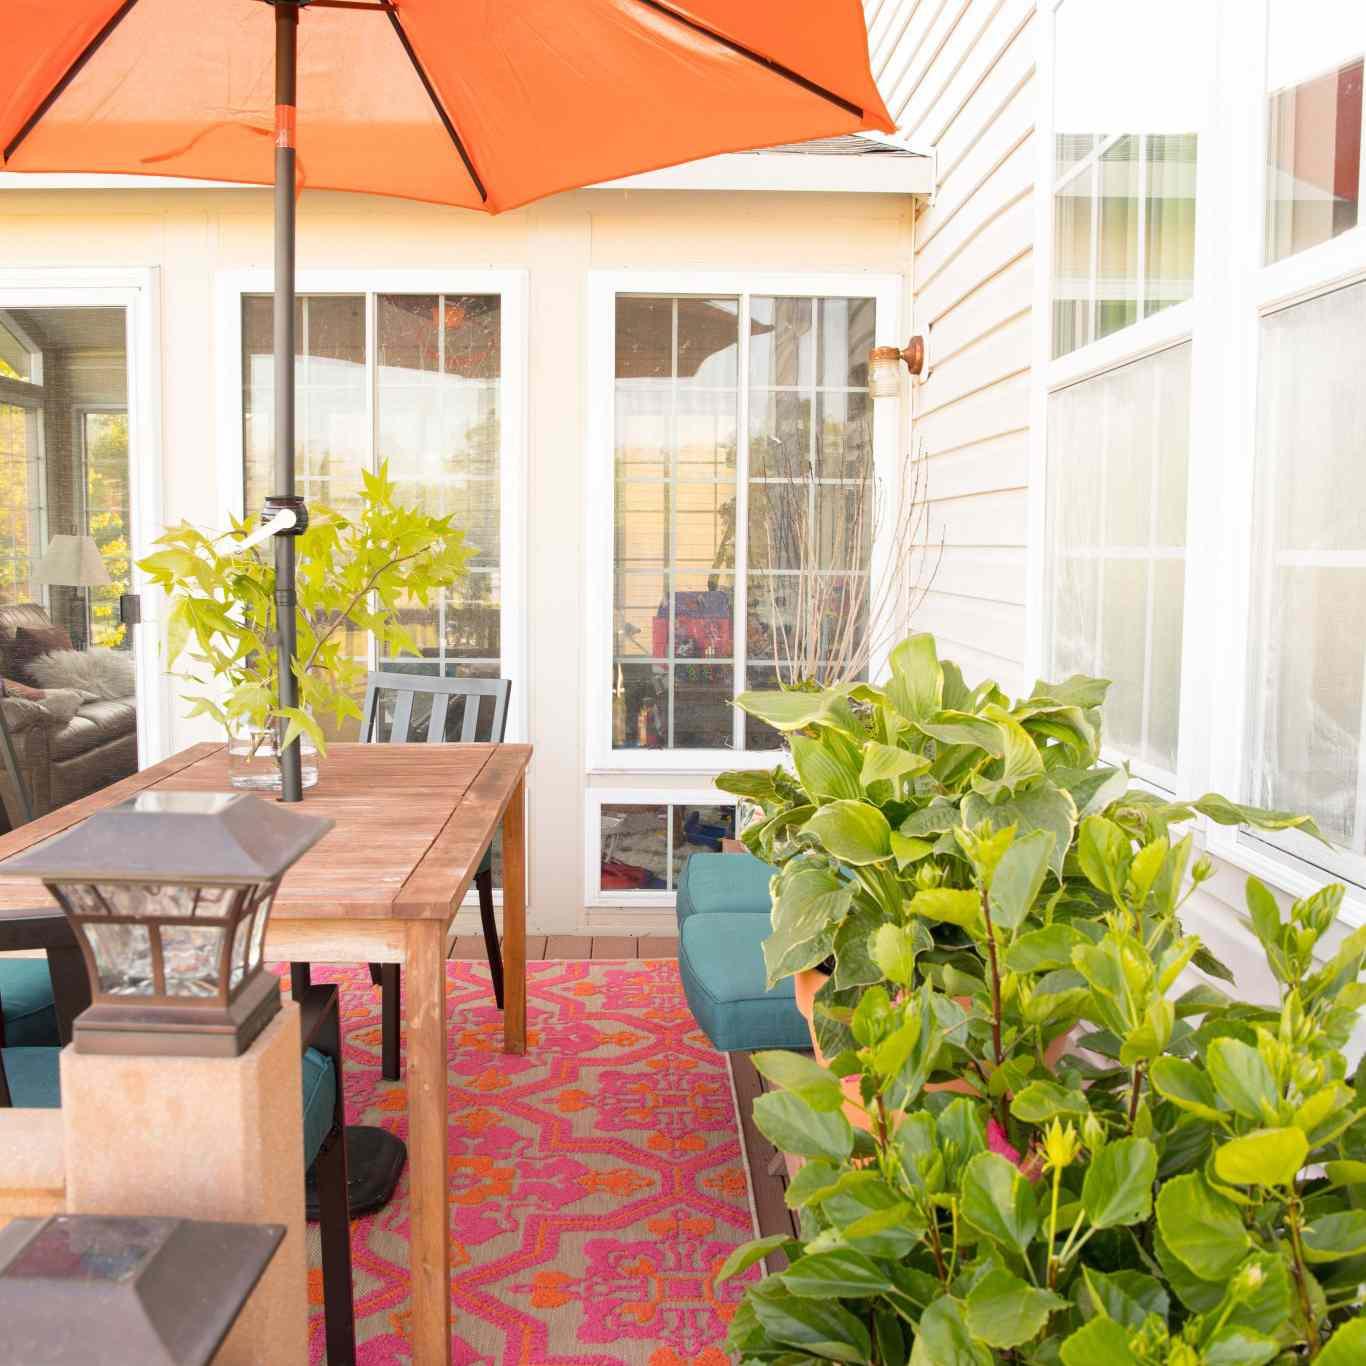 Casa Watkins living outdoor dining shade